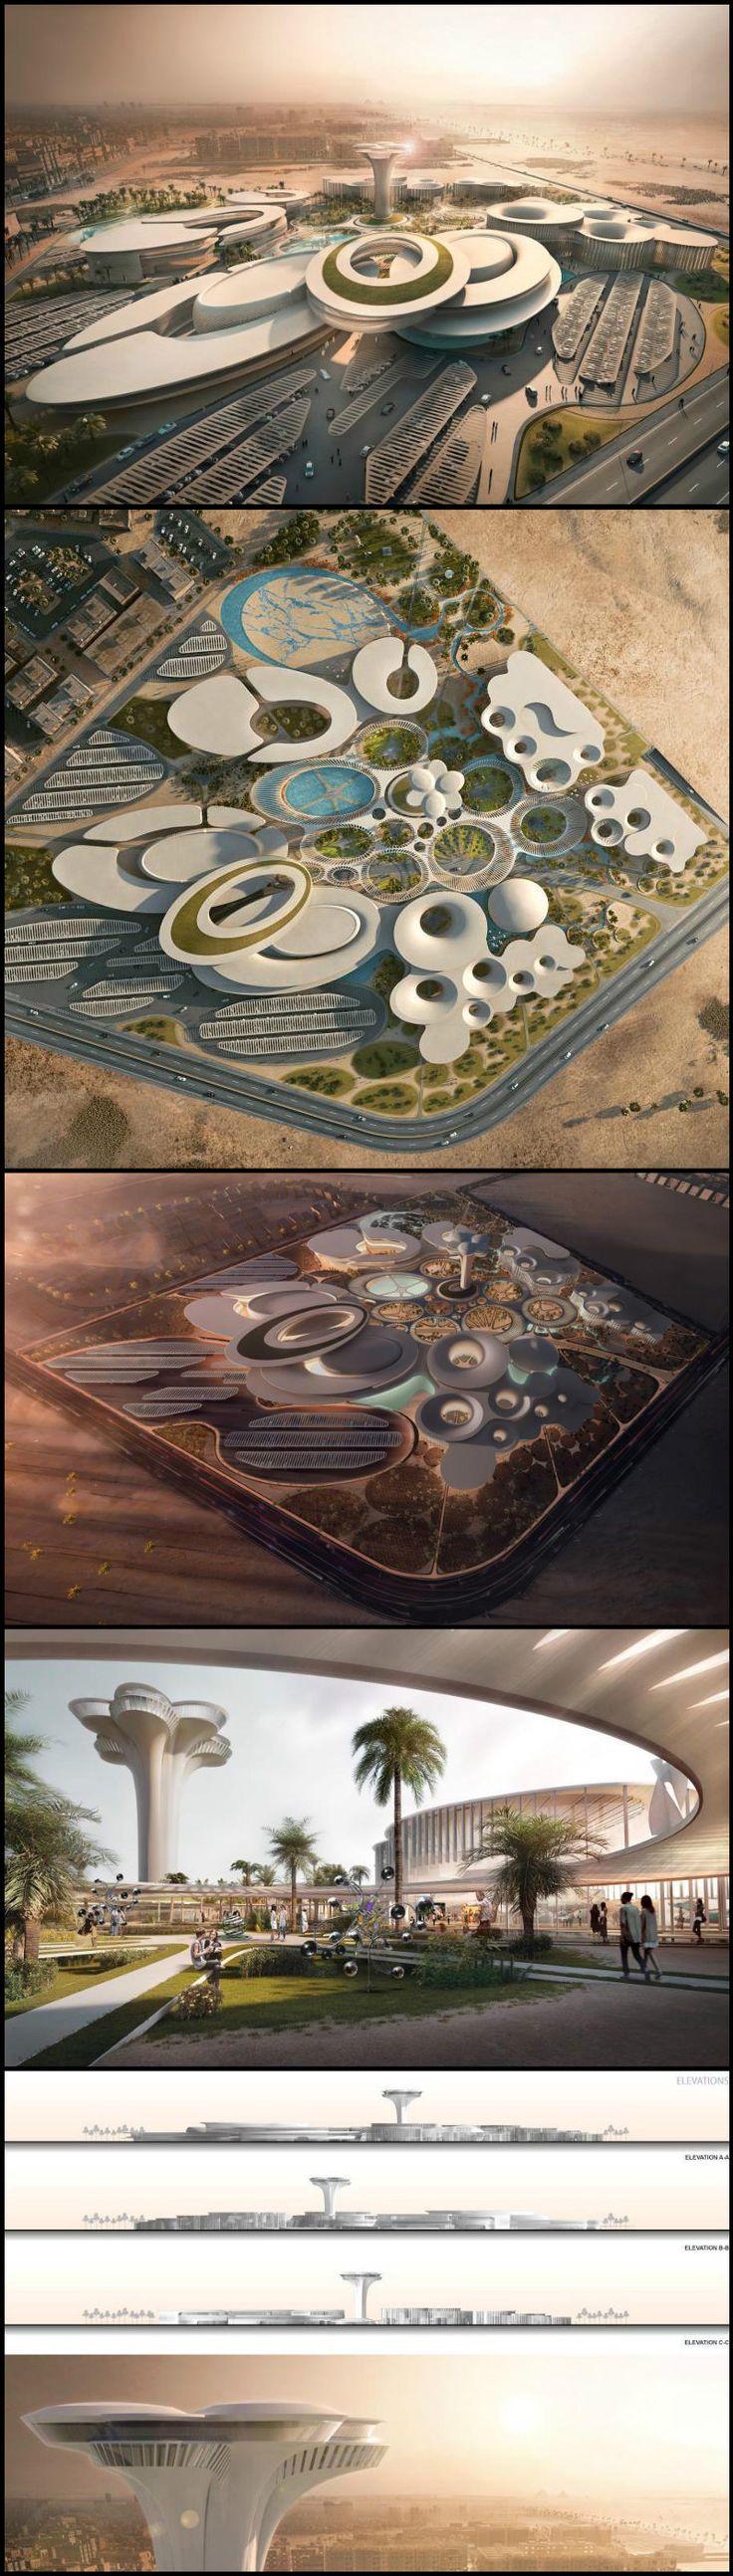 3rd Prize: Zaha Hadid Architects More